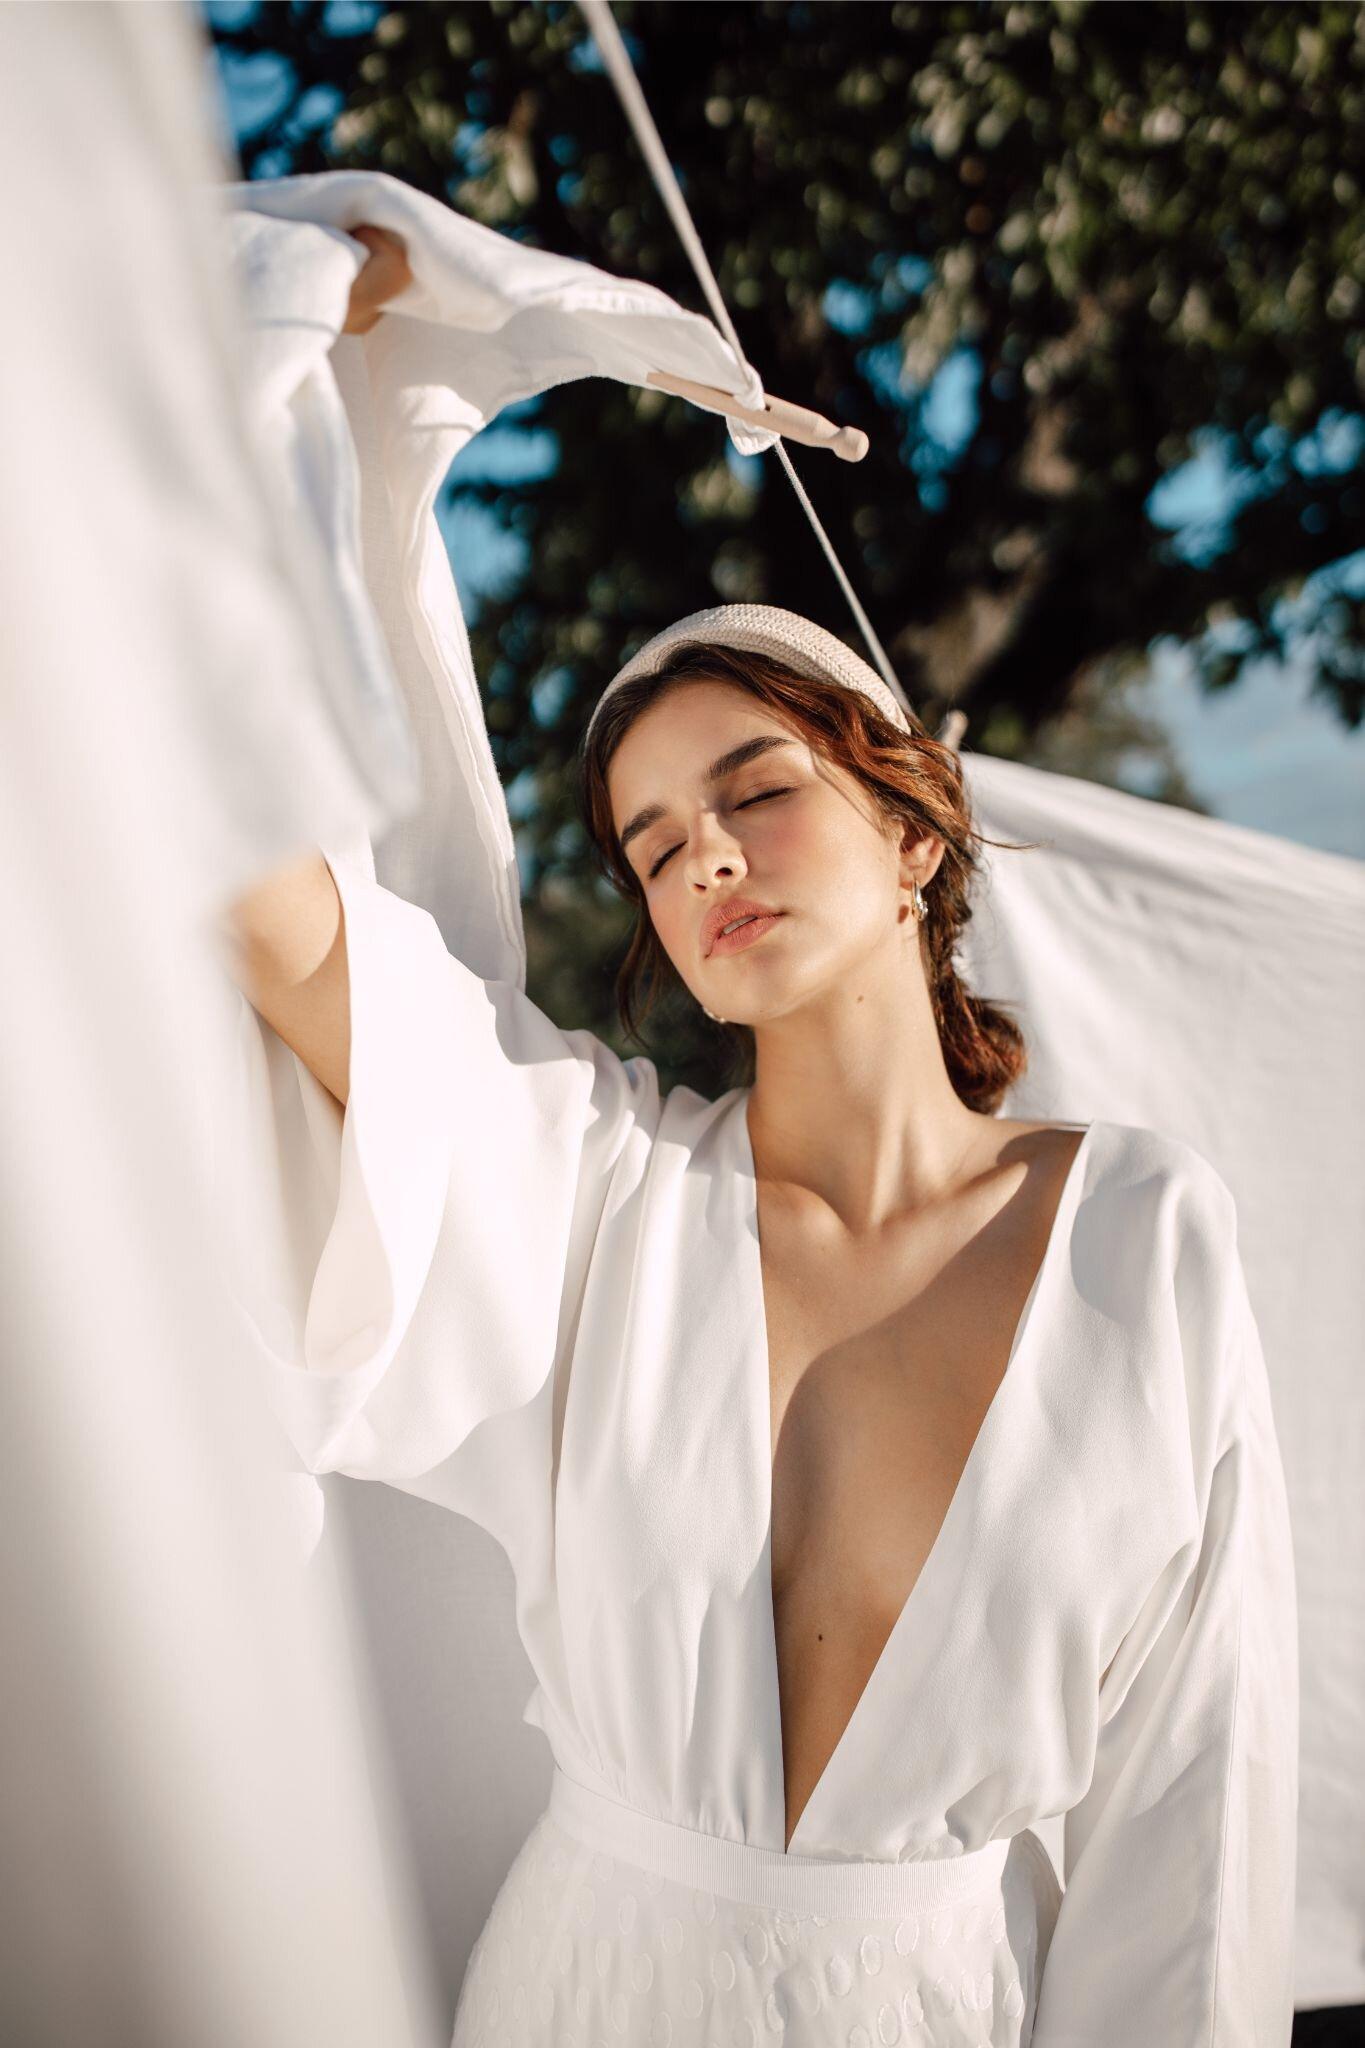 the-saums-charlie-brear-summer-bride-fashion-editorial-21.jpg